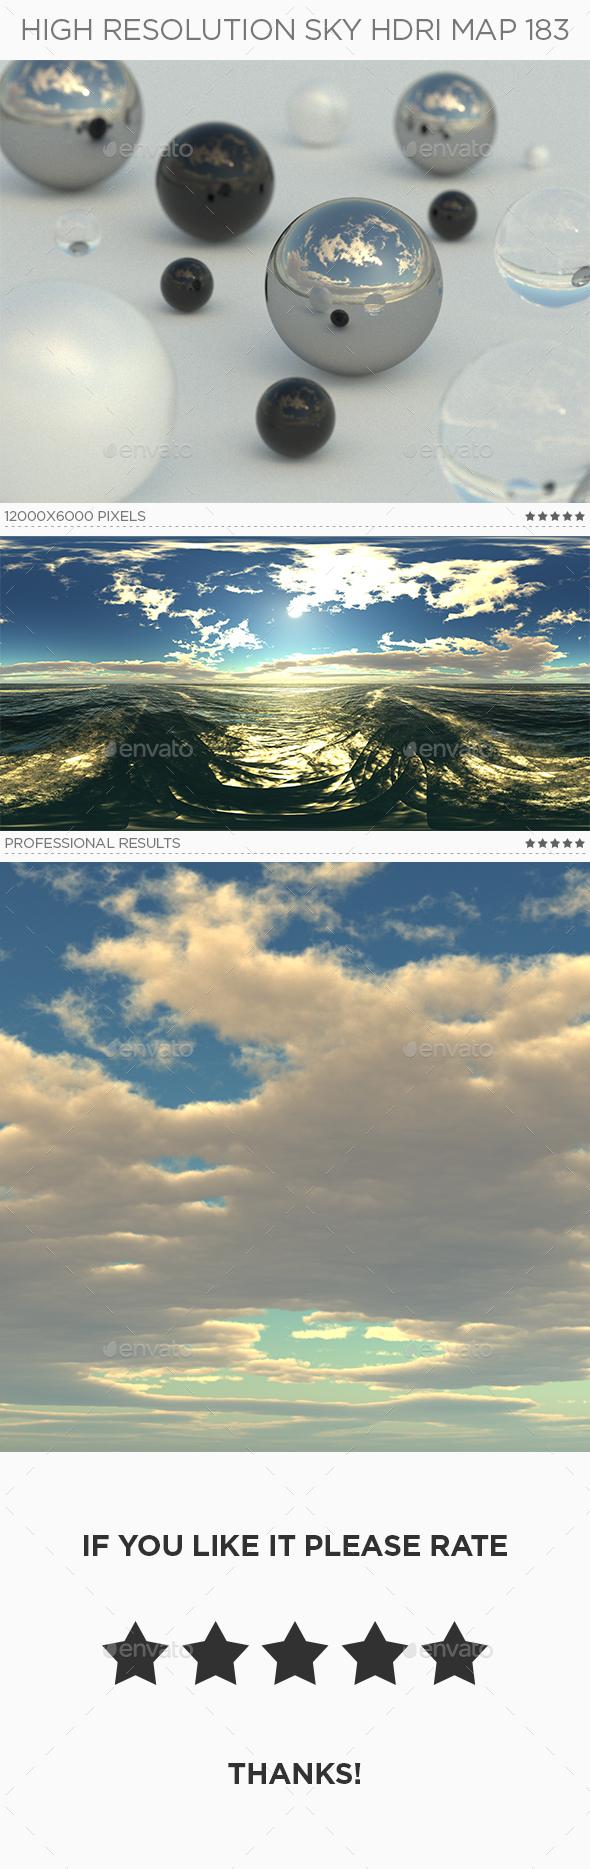 High Resolution Sky HDRi Map 183 - 3DOcean Item for Sale